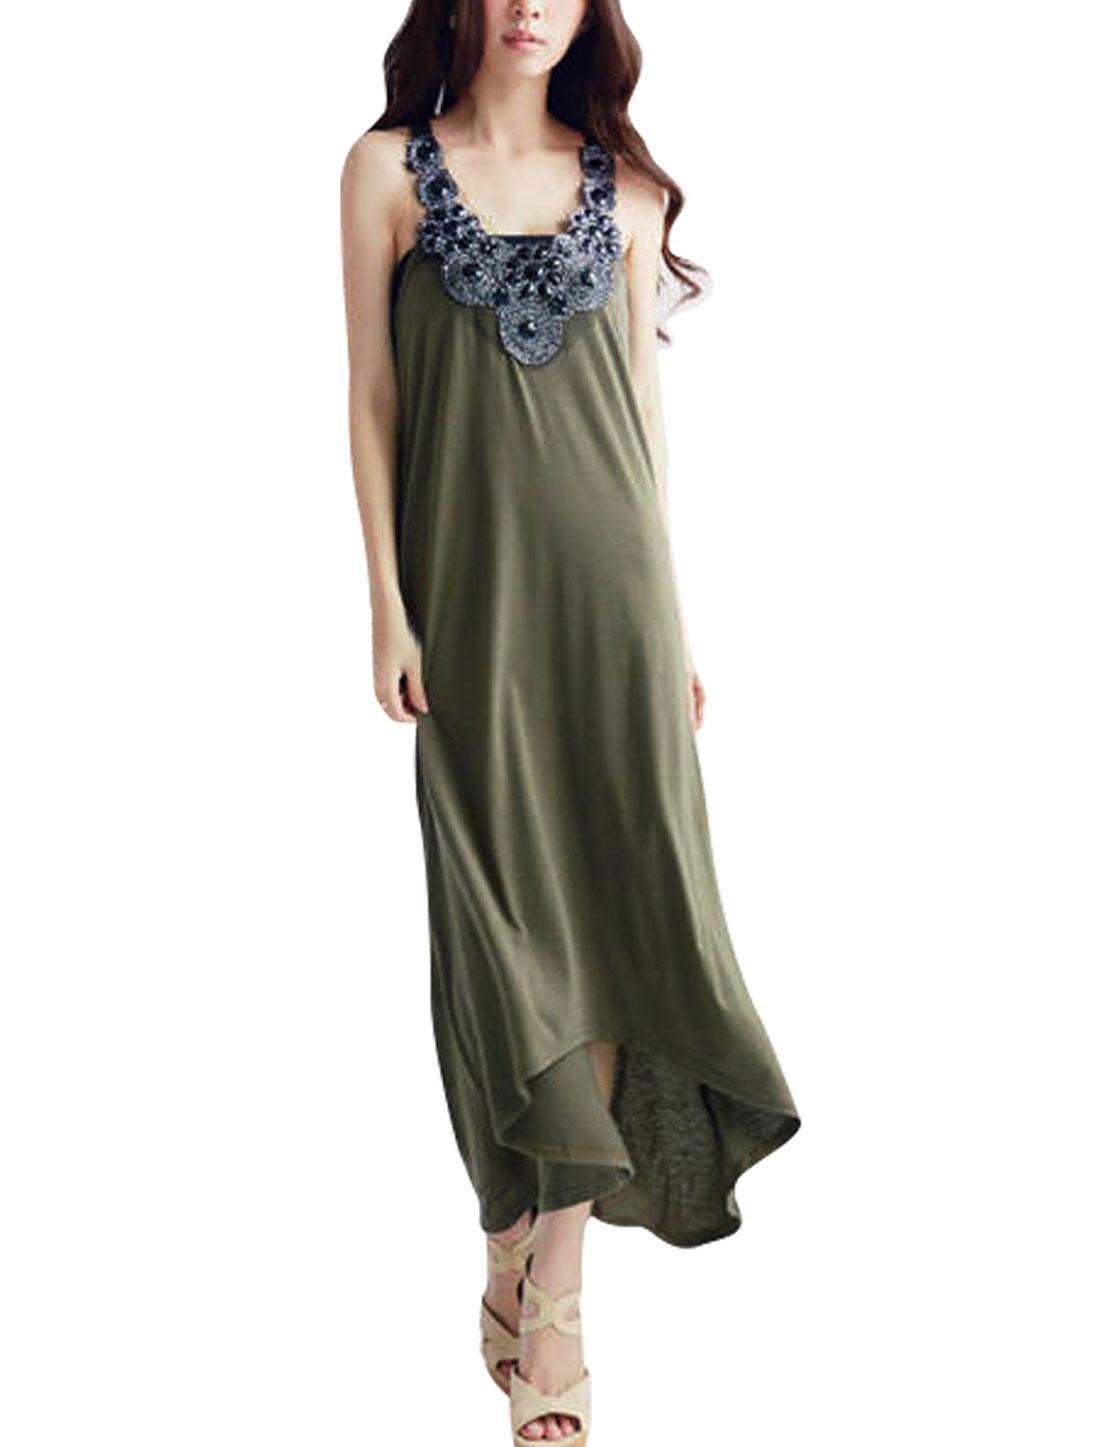 Woman Rhinestones Decor Sleeveless Crochet Splice Army Green Mid-Calf Dress XS